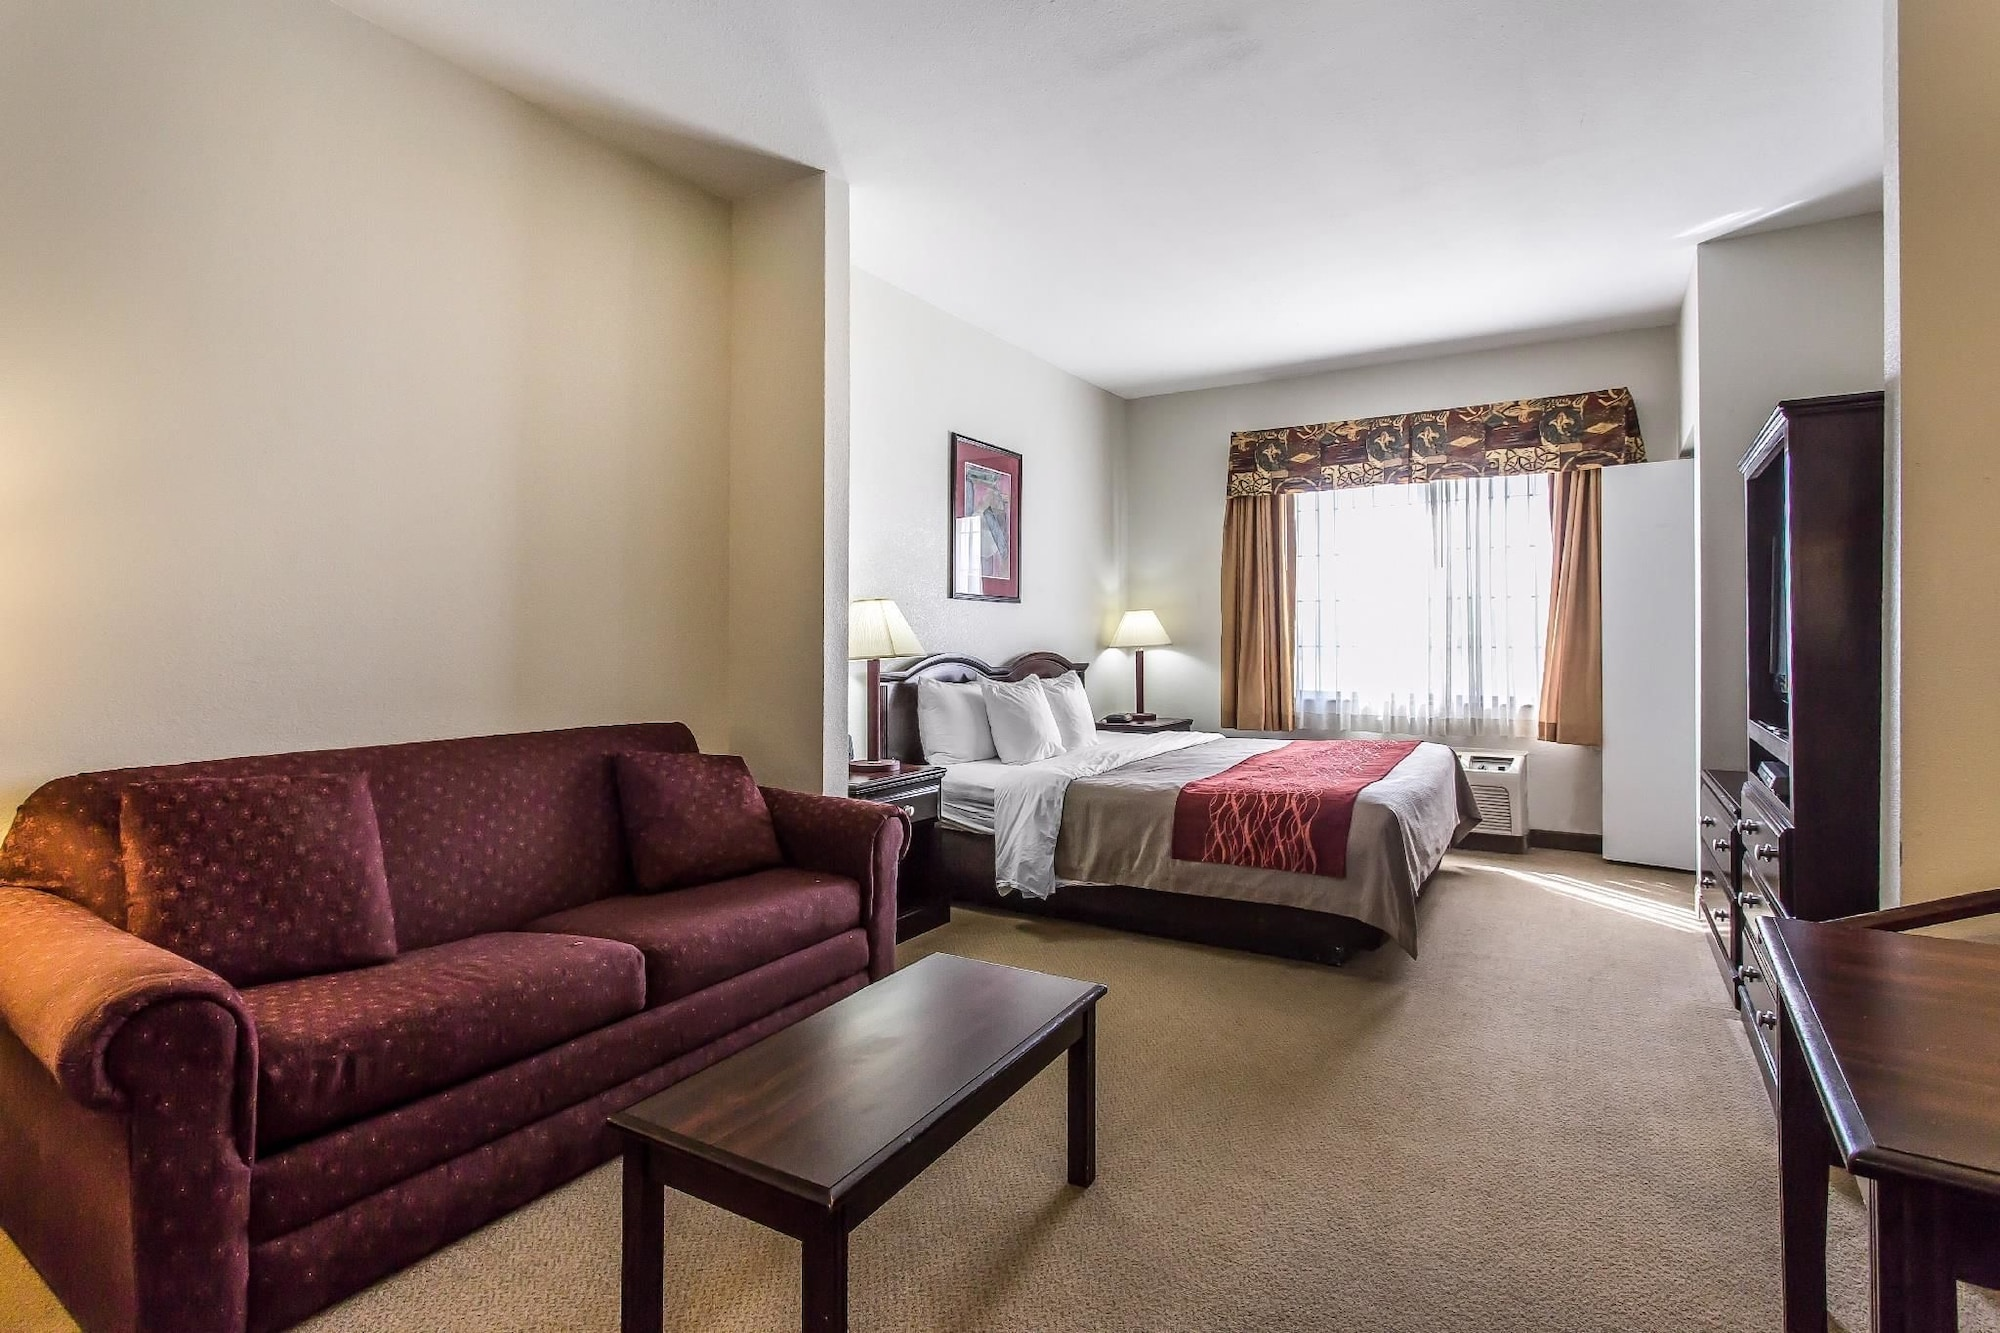 Quality Inn & Suites, Texas